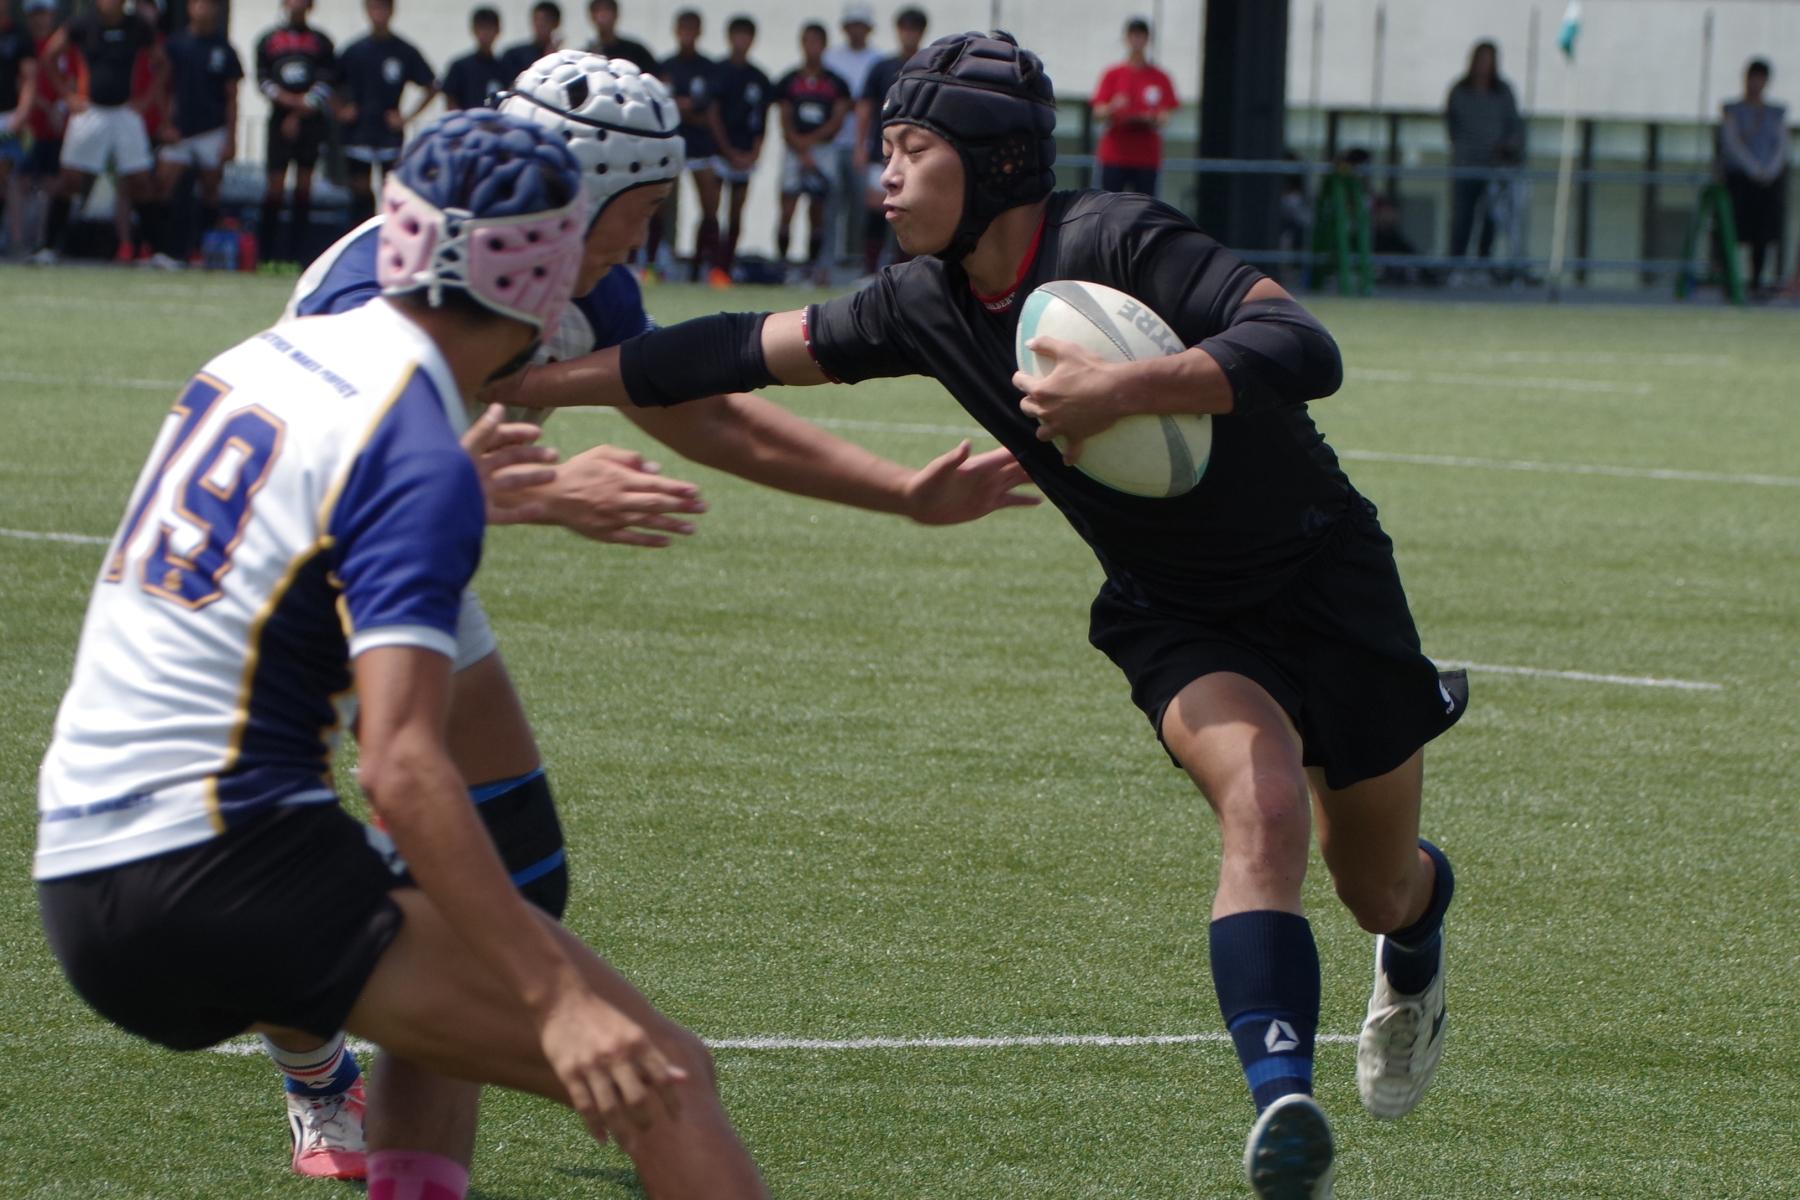 http://kokura-rugby.sakura.ne.jp/180902_134108_0393.jpg